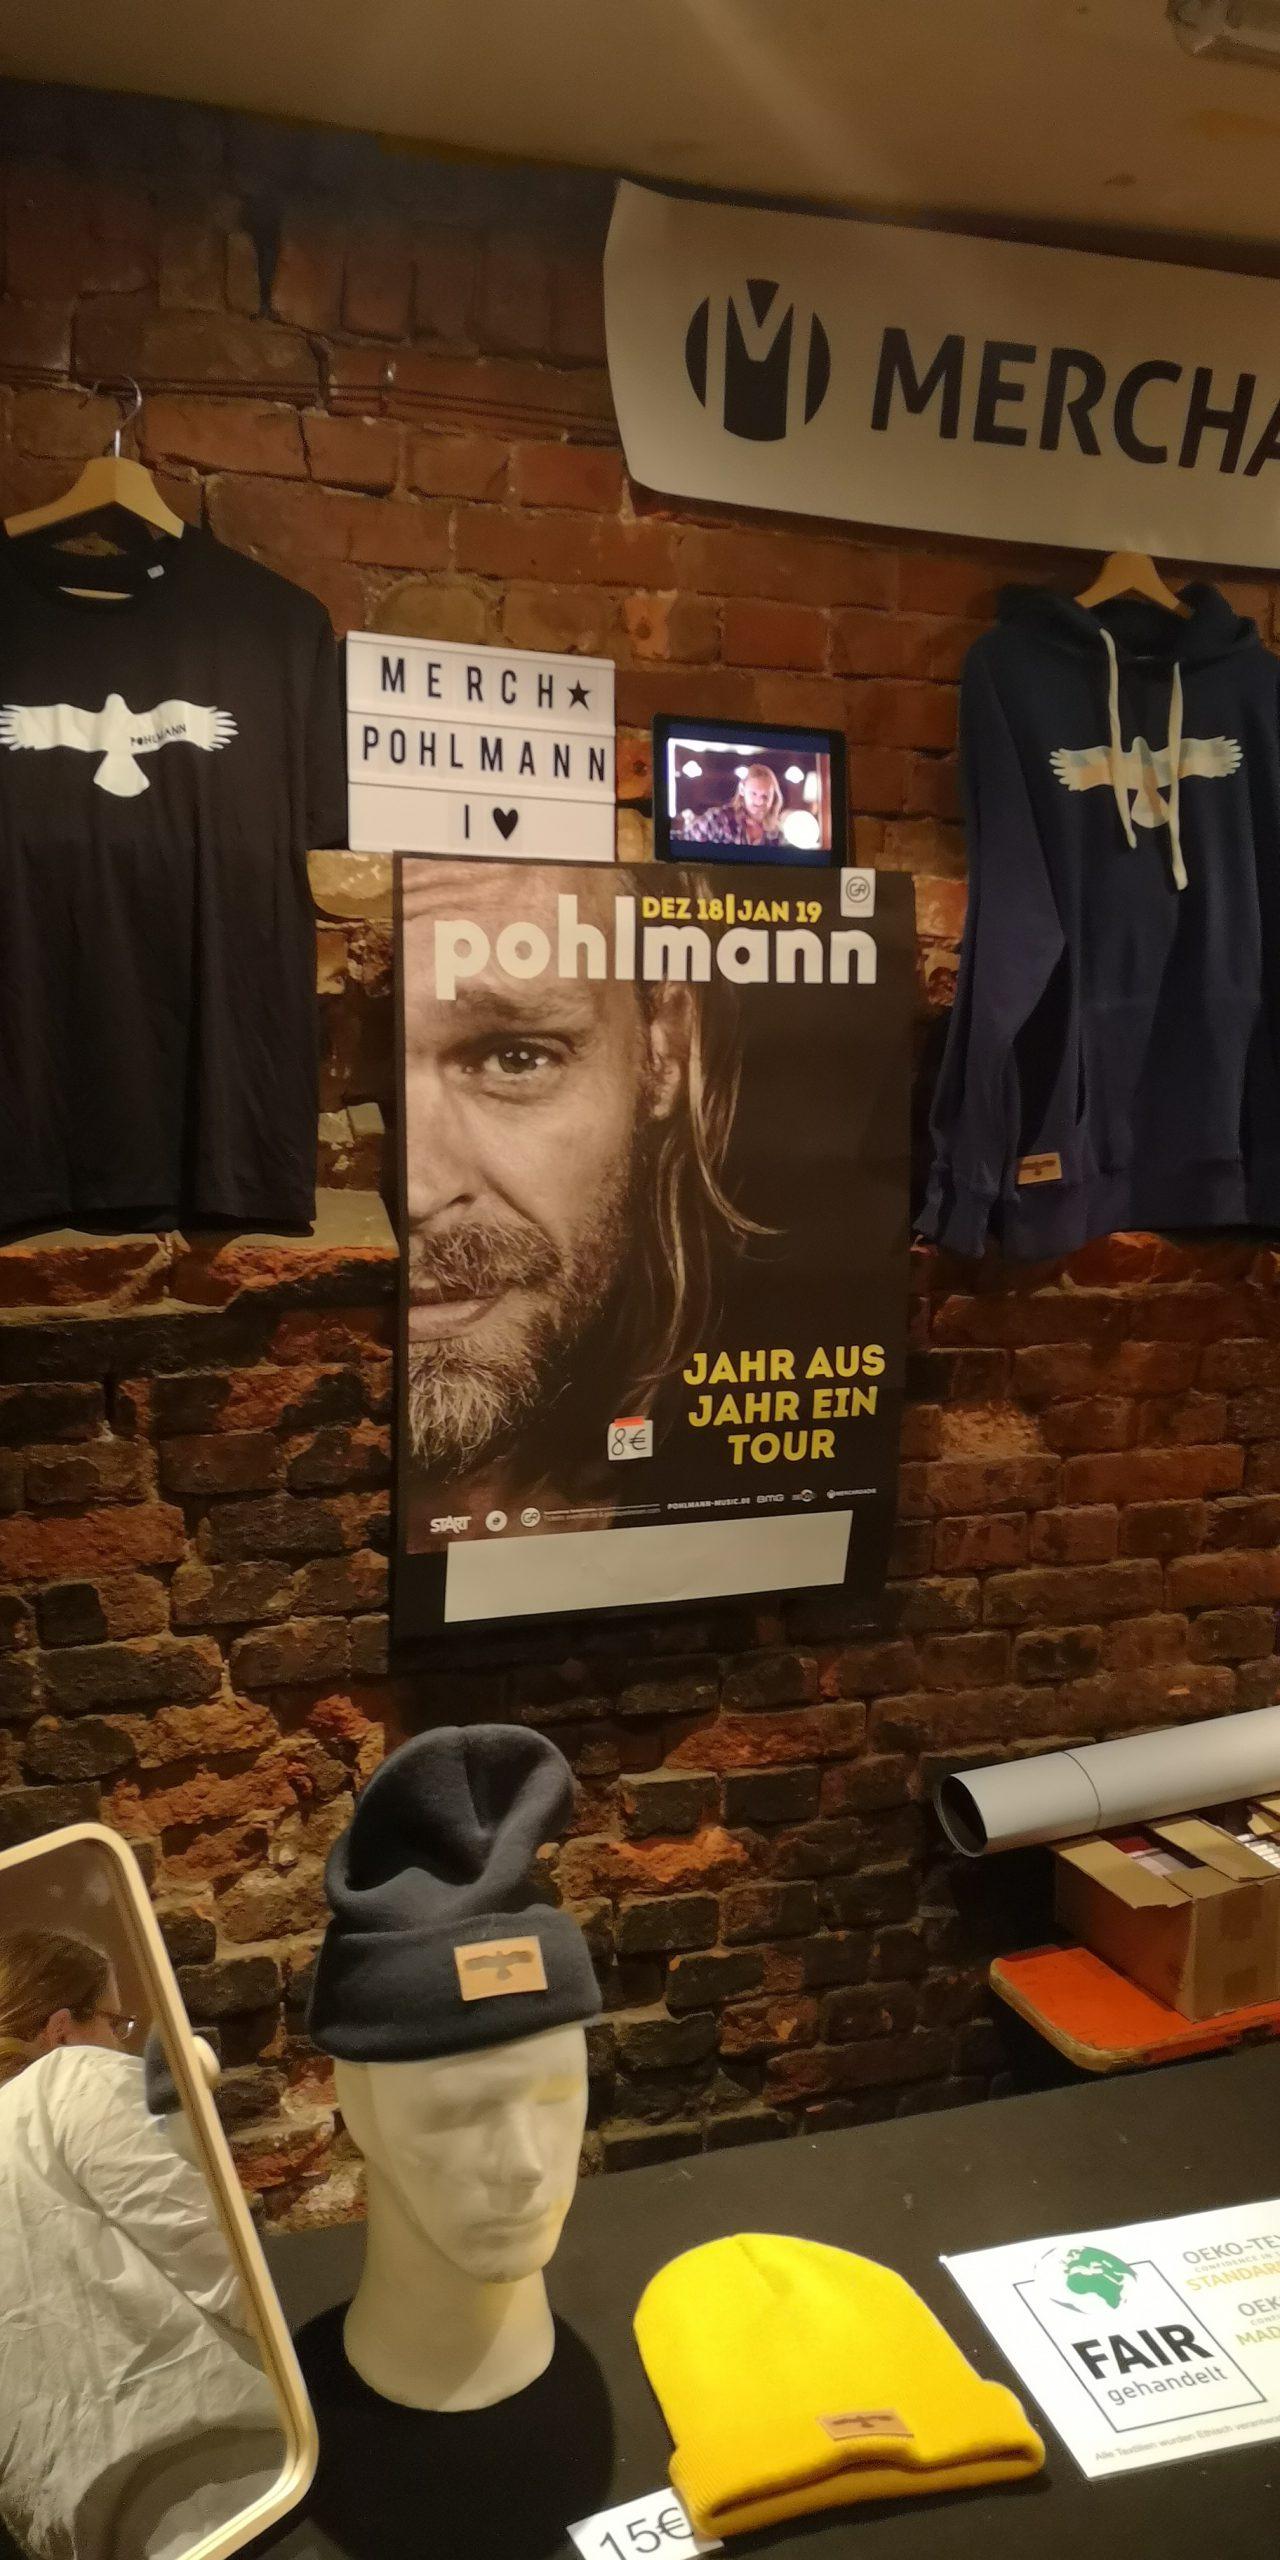 +++ Pohlmann live +++